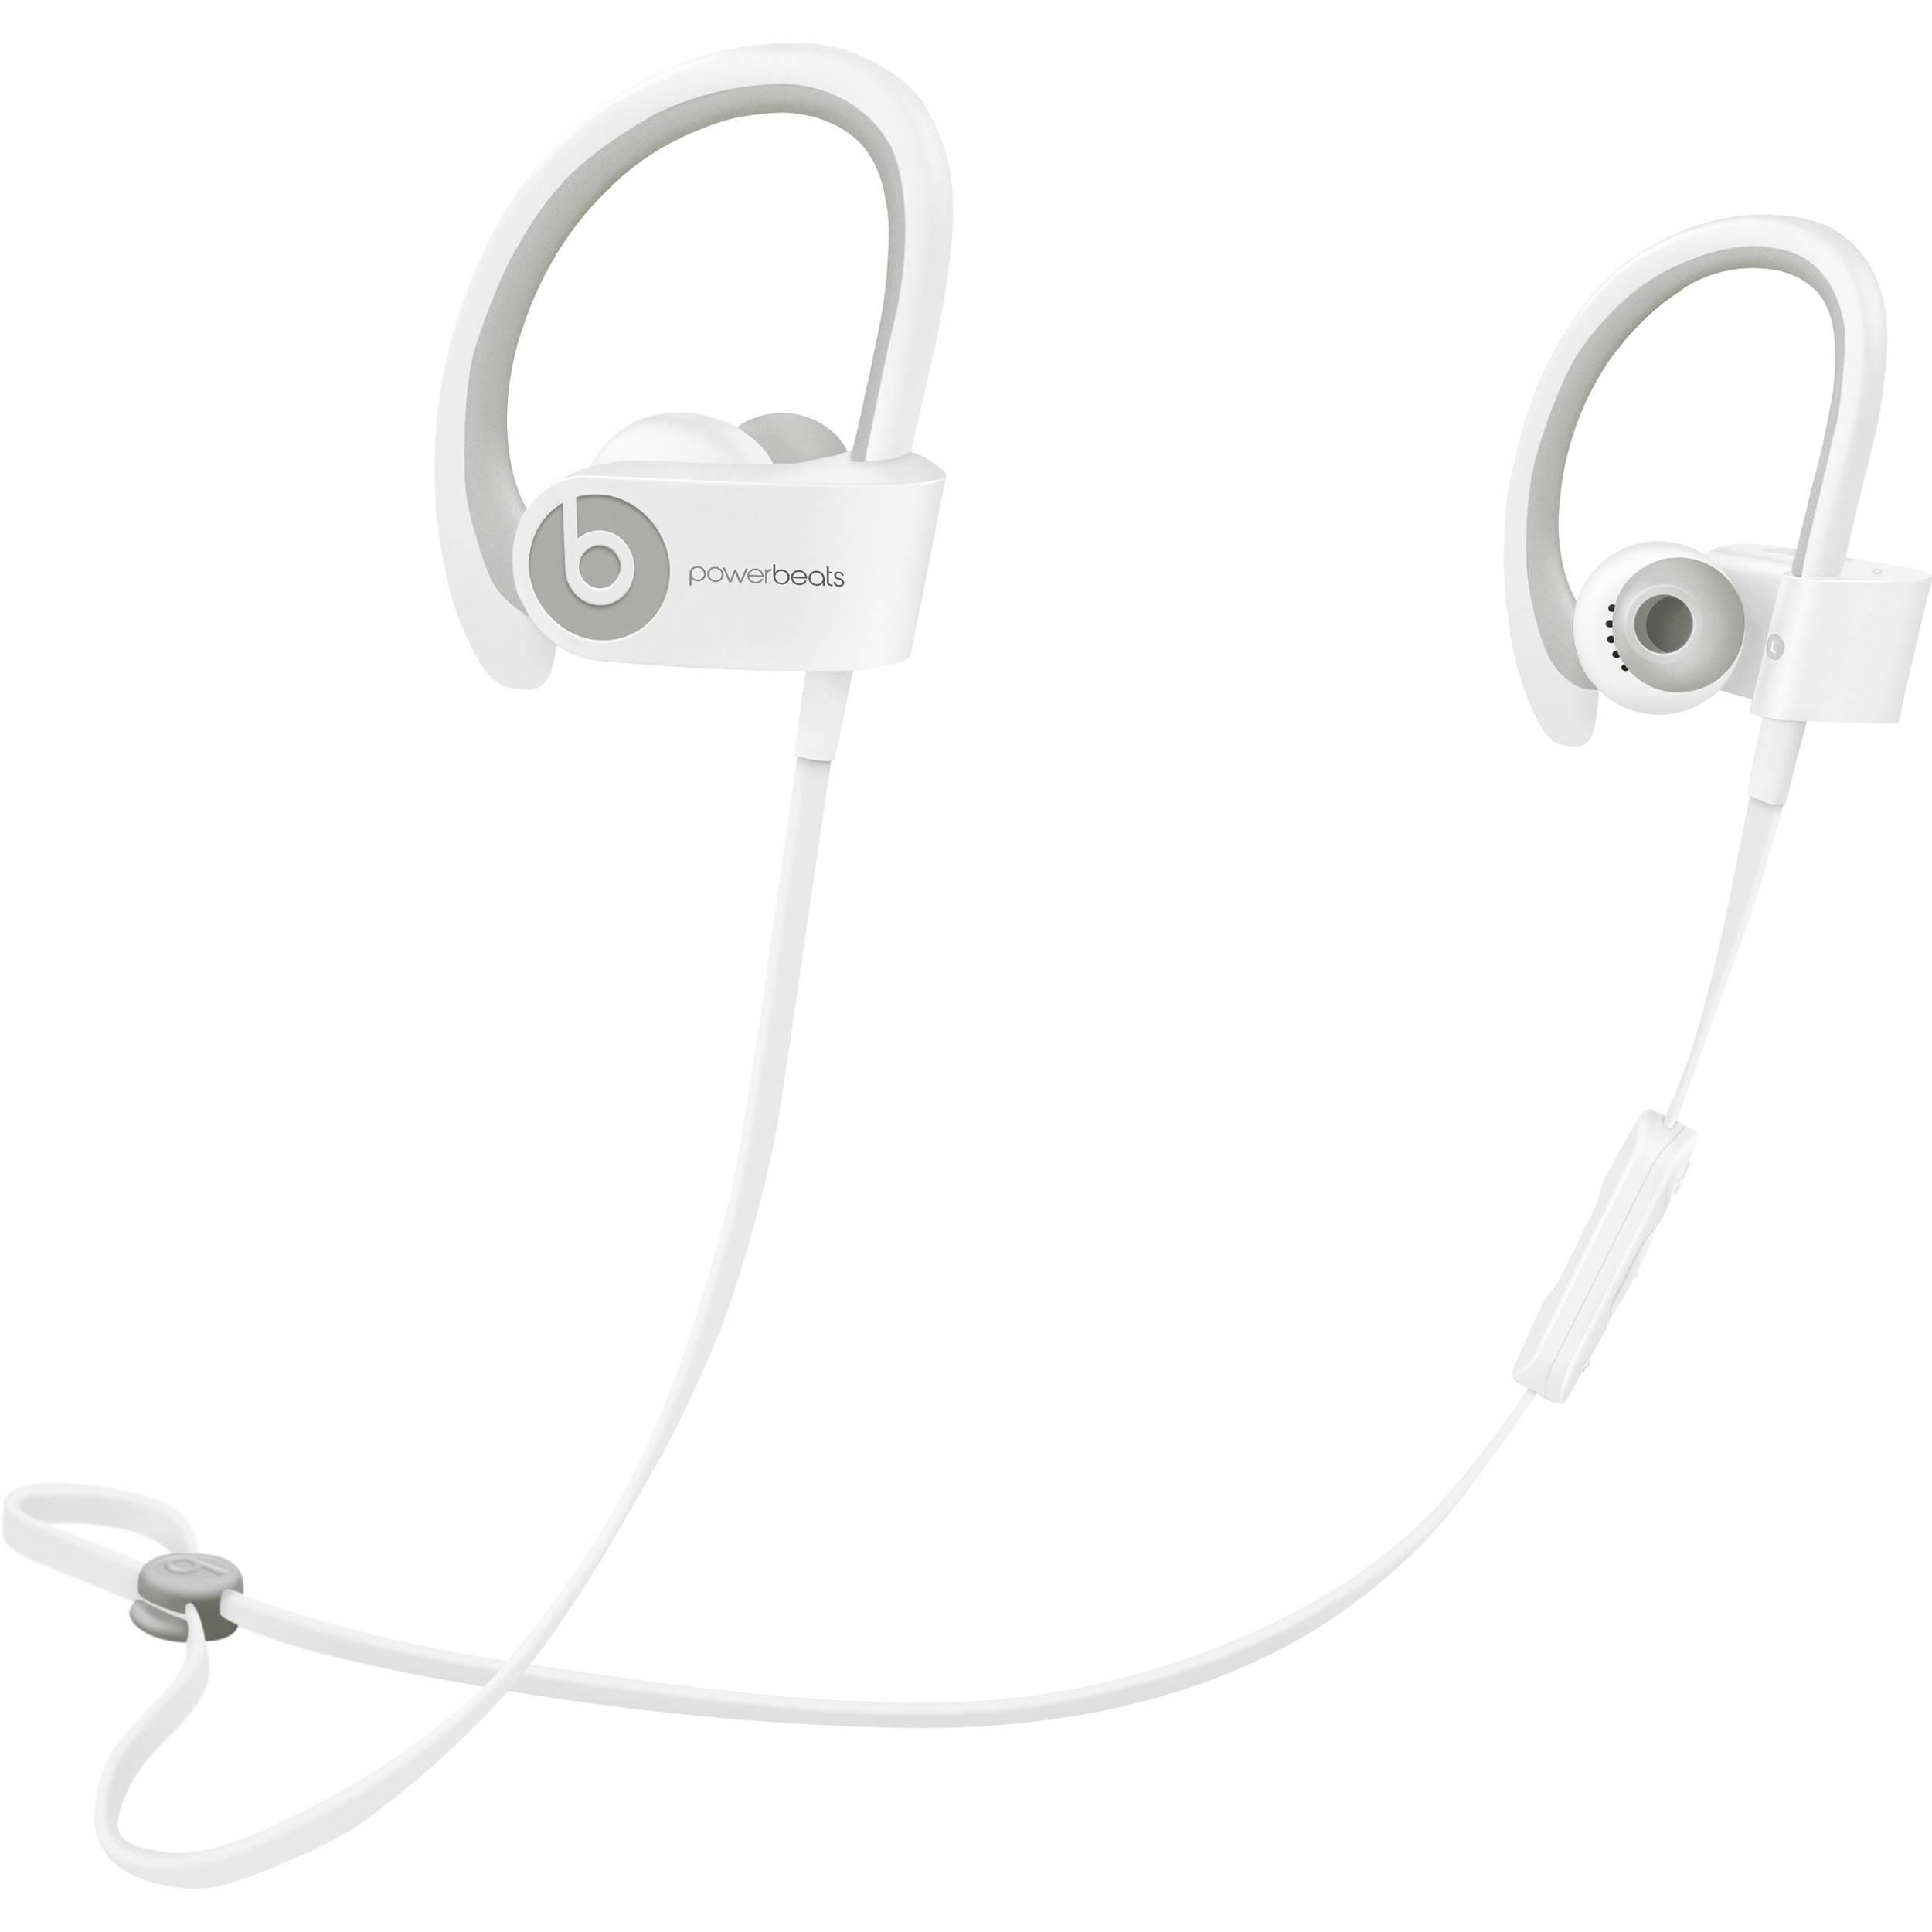 Earbuds beats dre - beats bluetooth earbuds white